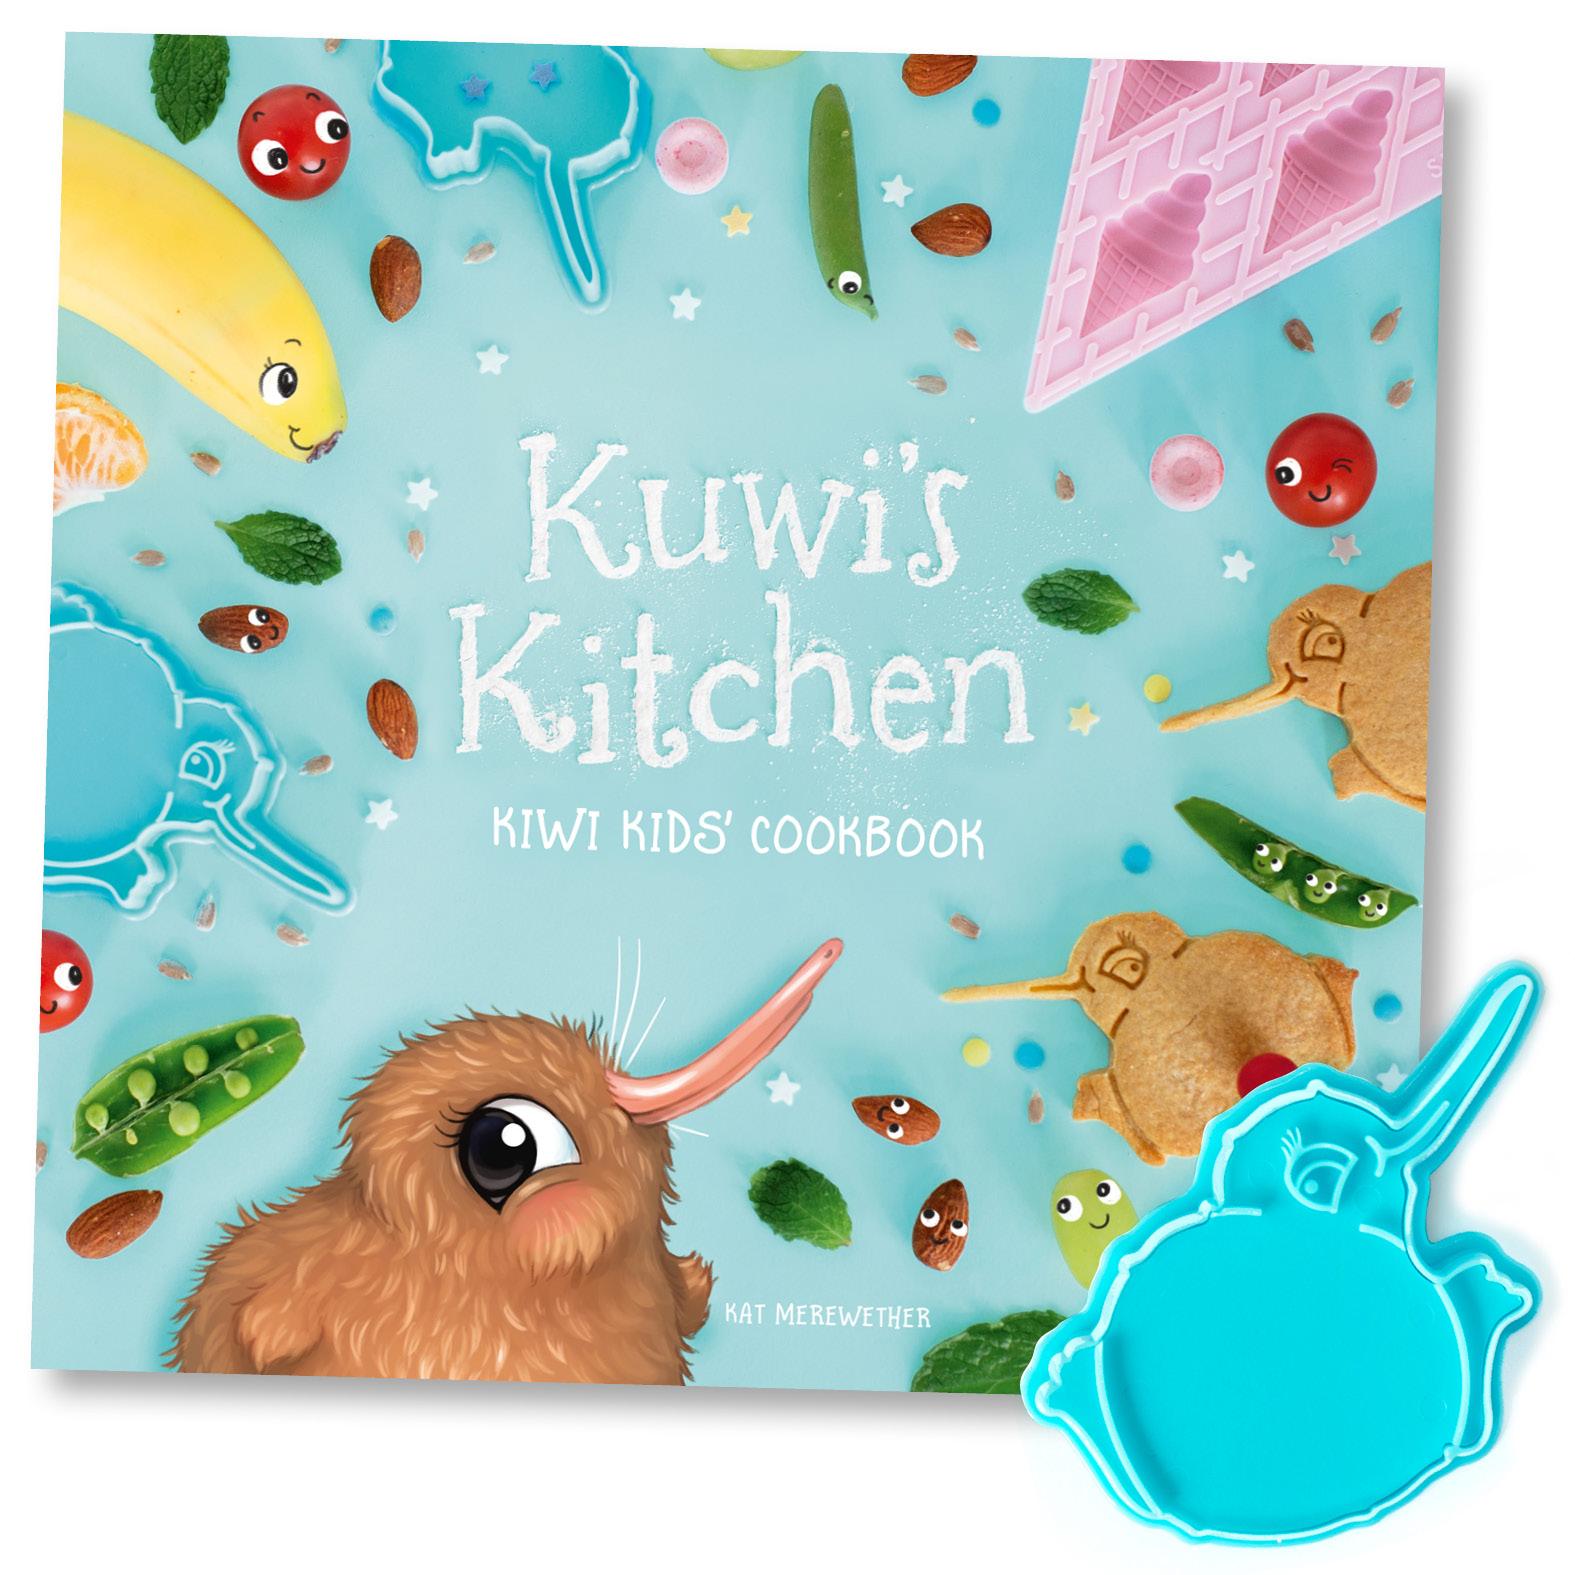 Kuwi's Kitchen Kiwi Kids' Cookbook - By Kat MerewetherComes with FREE Kuwi Bikkie Cutter